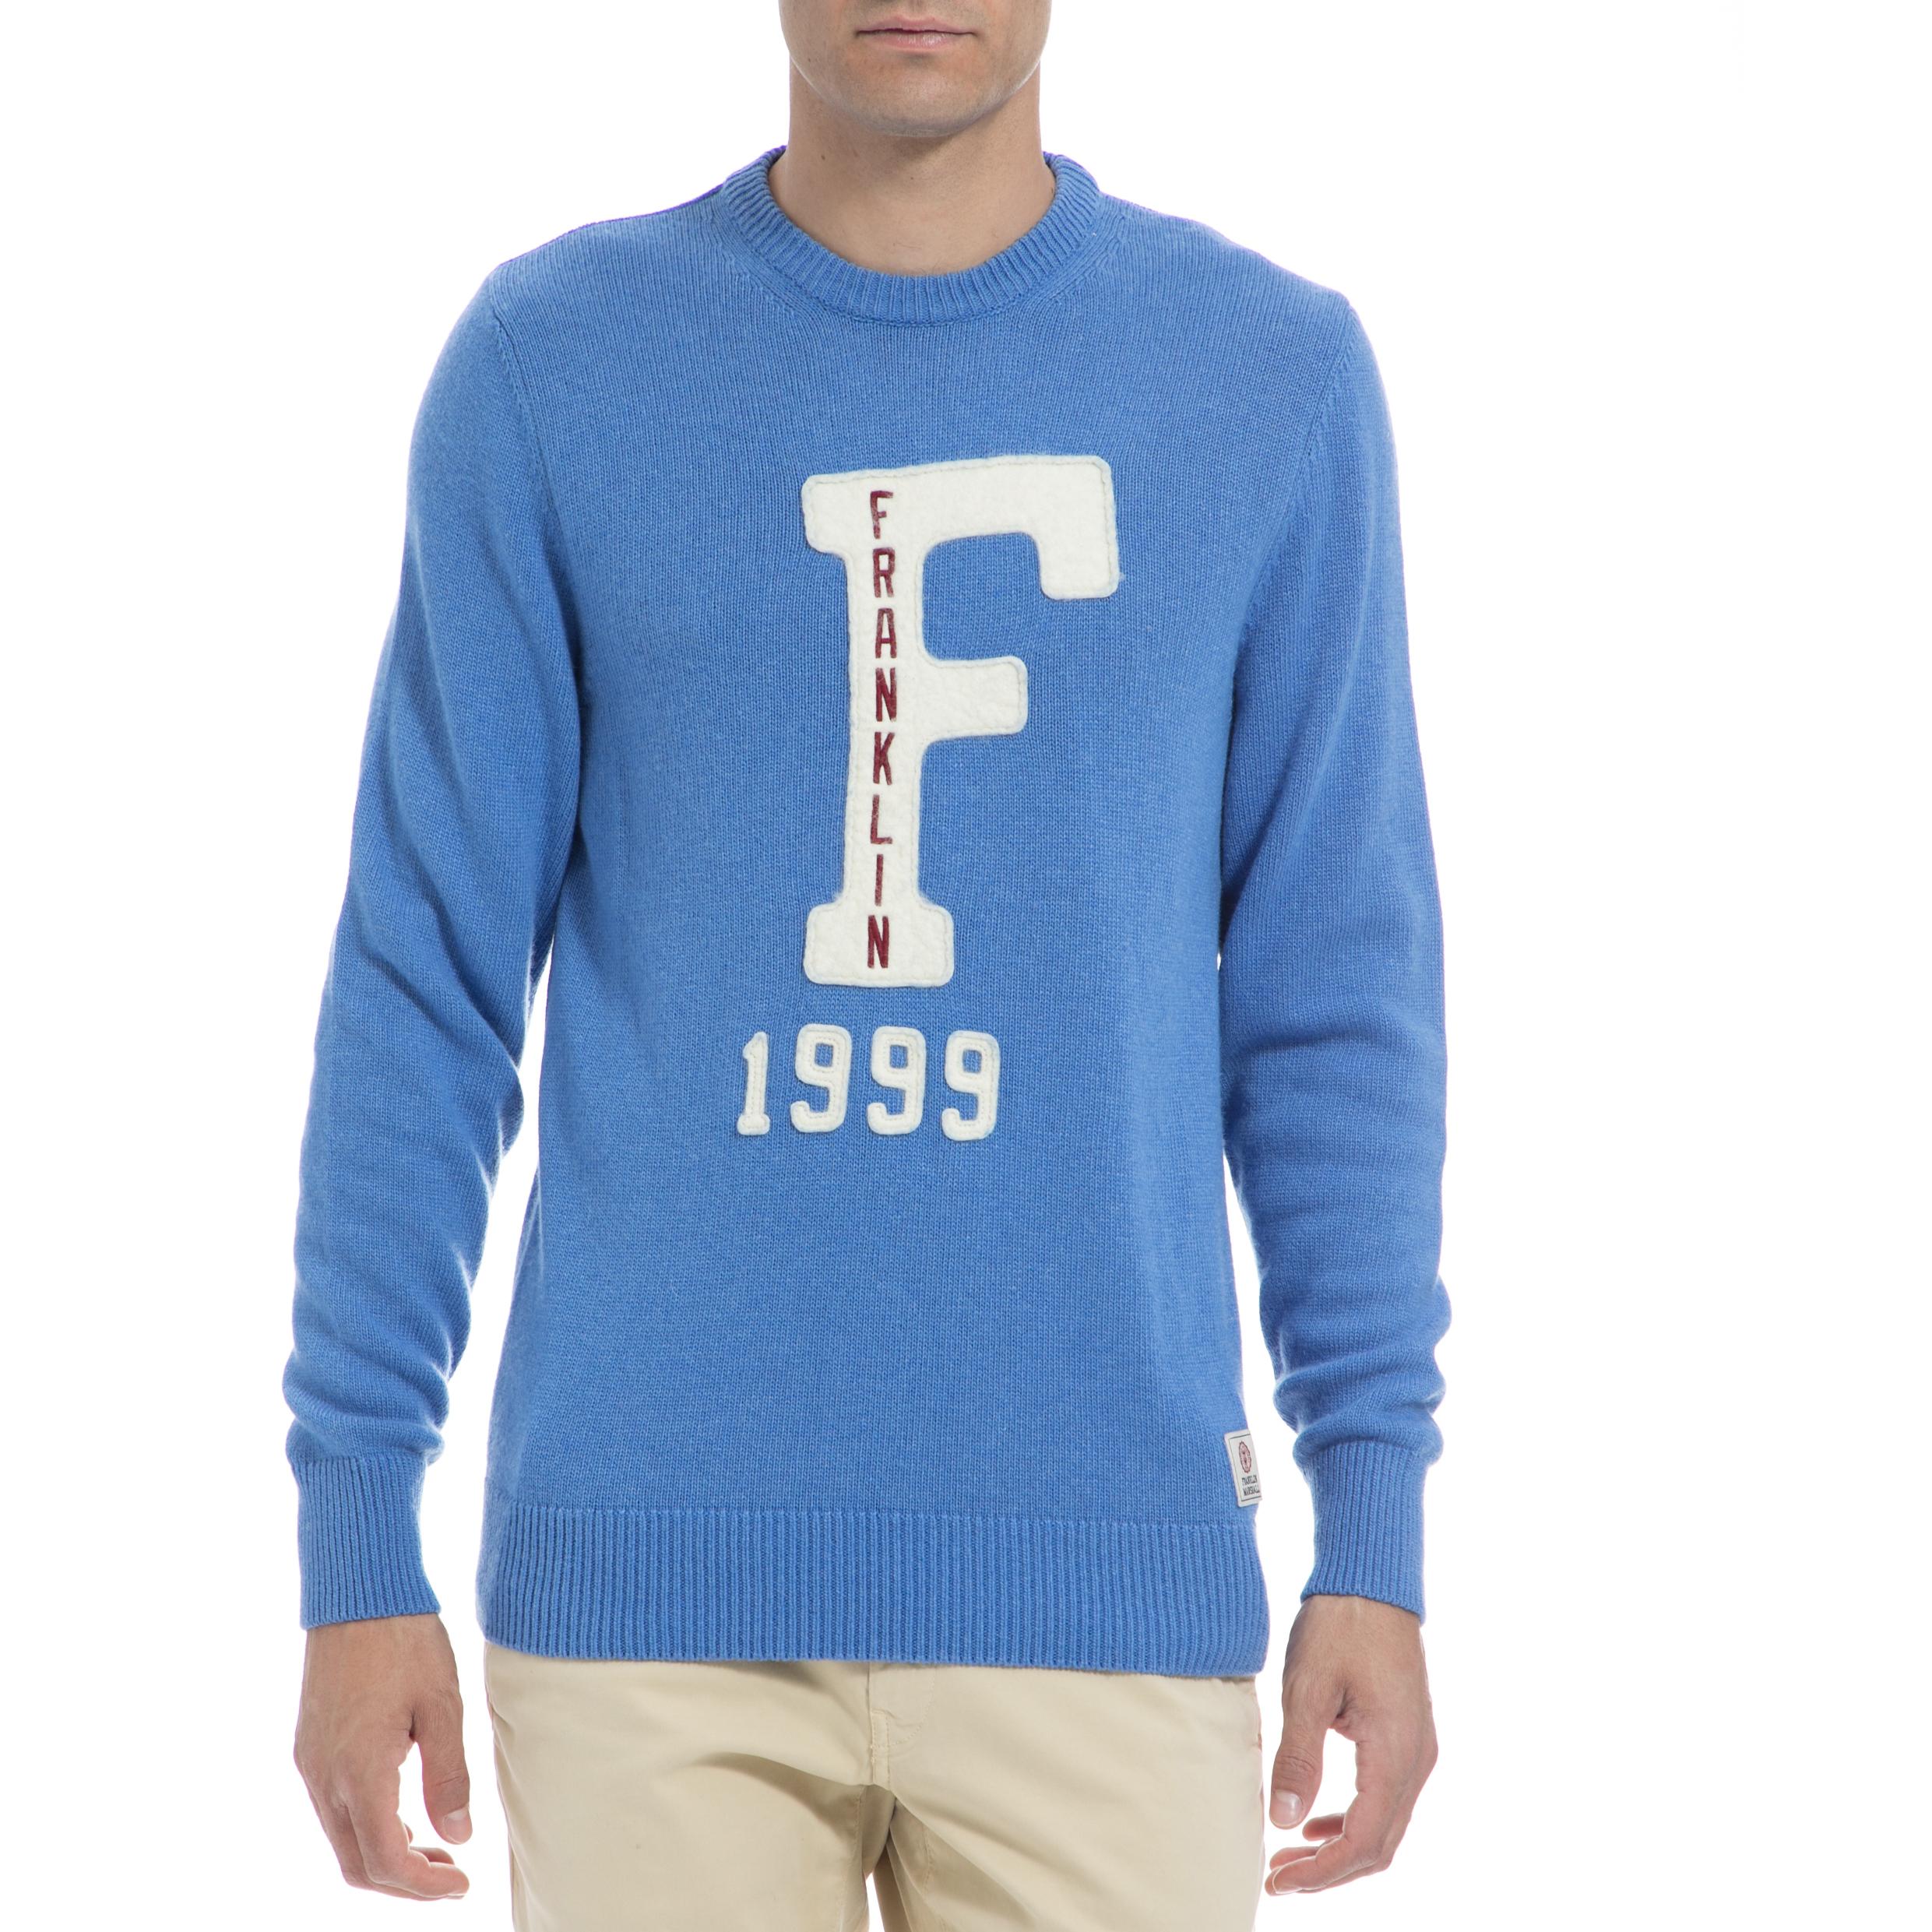 FRANKLIN & MARSHALL - Αντρικό πουλόβερ FRANKLIN & MARSHALL μπλε ανδρικά ρούχα πλεκτά ζακέτες μπλούζες